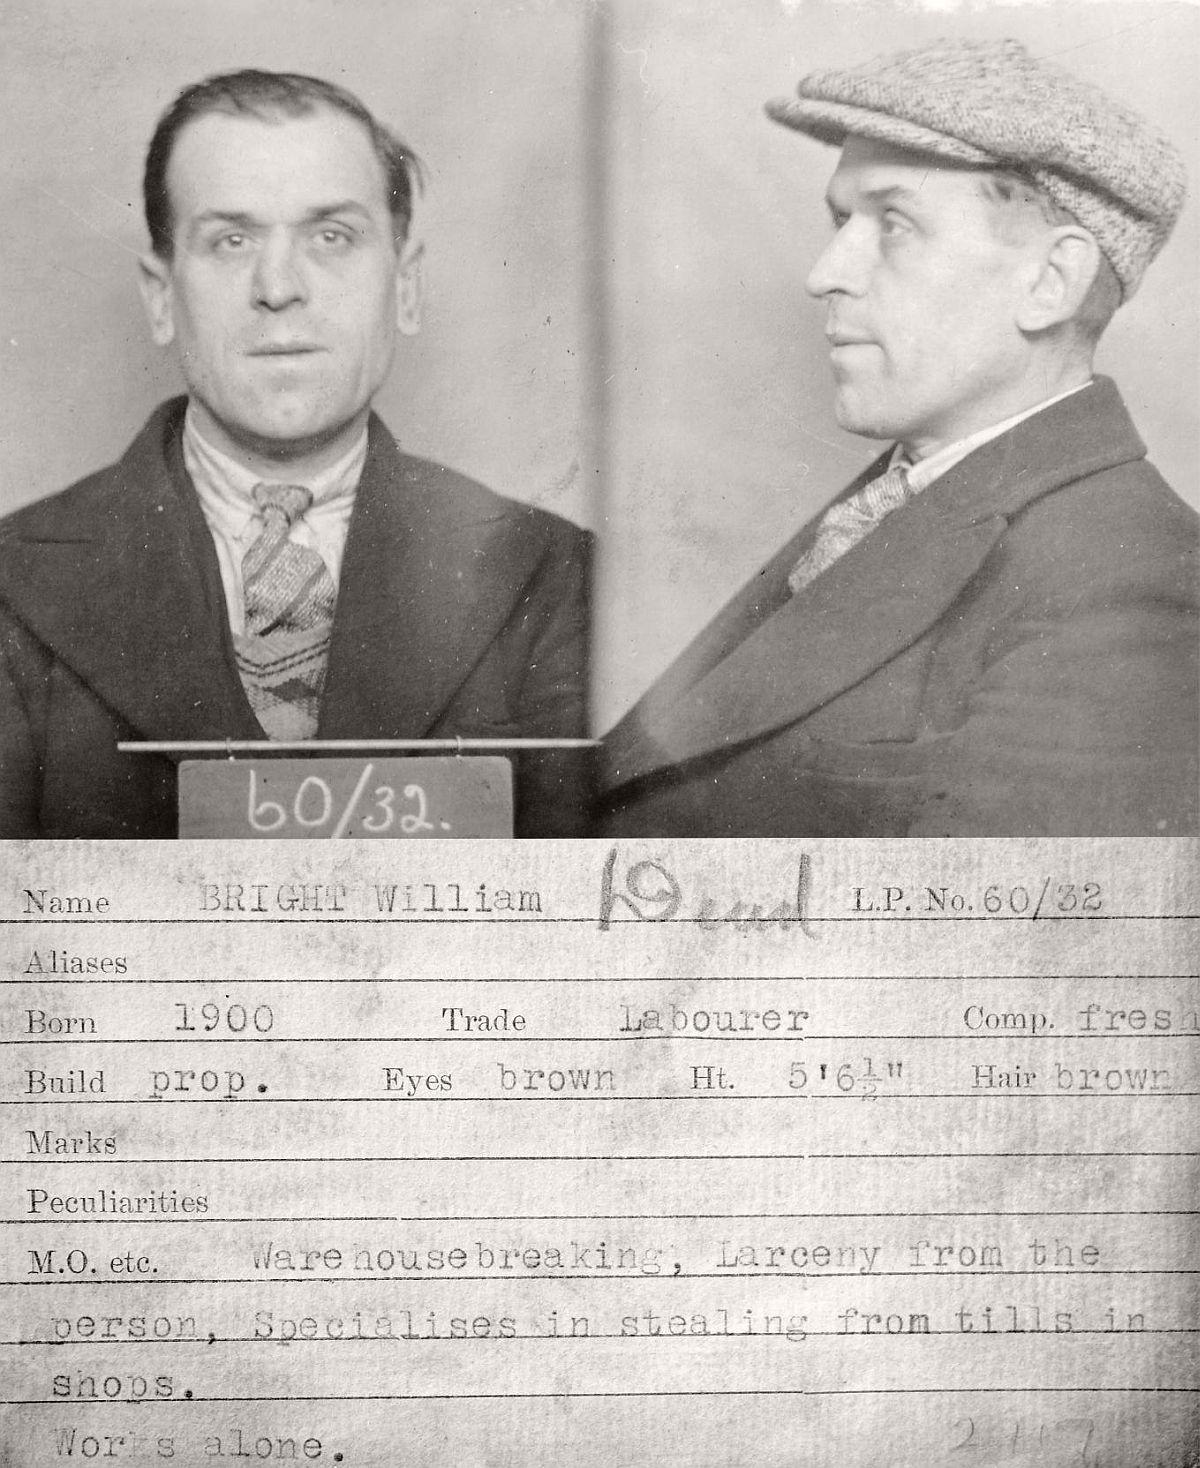 vintage-mug-shot-of-criminals-from-newcastle-upon-tyne-1930s-19